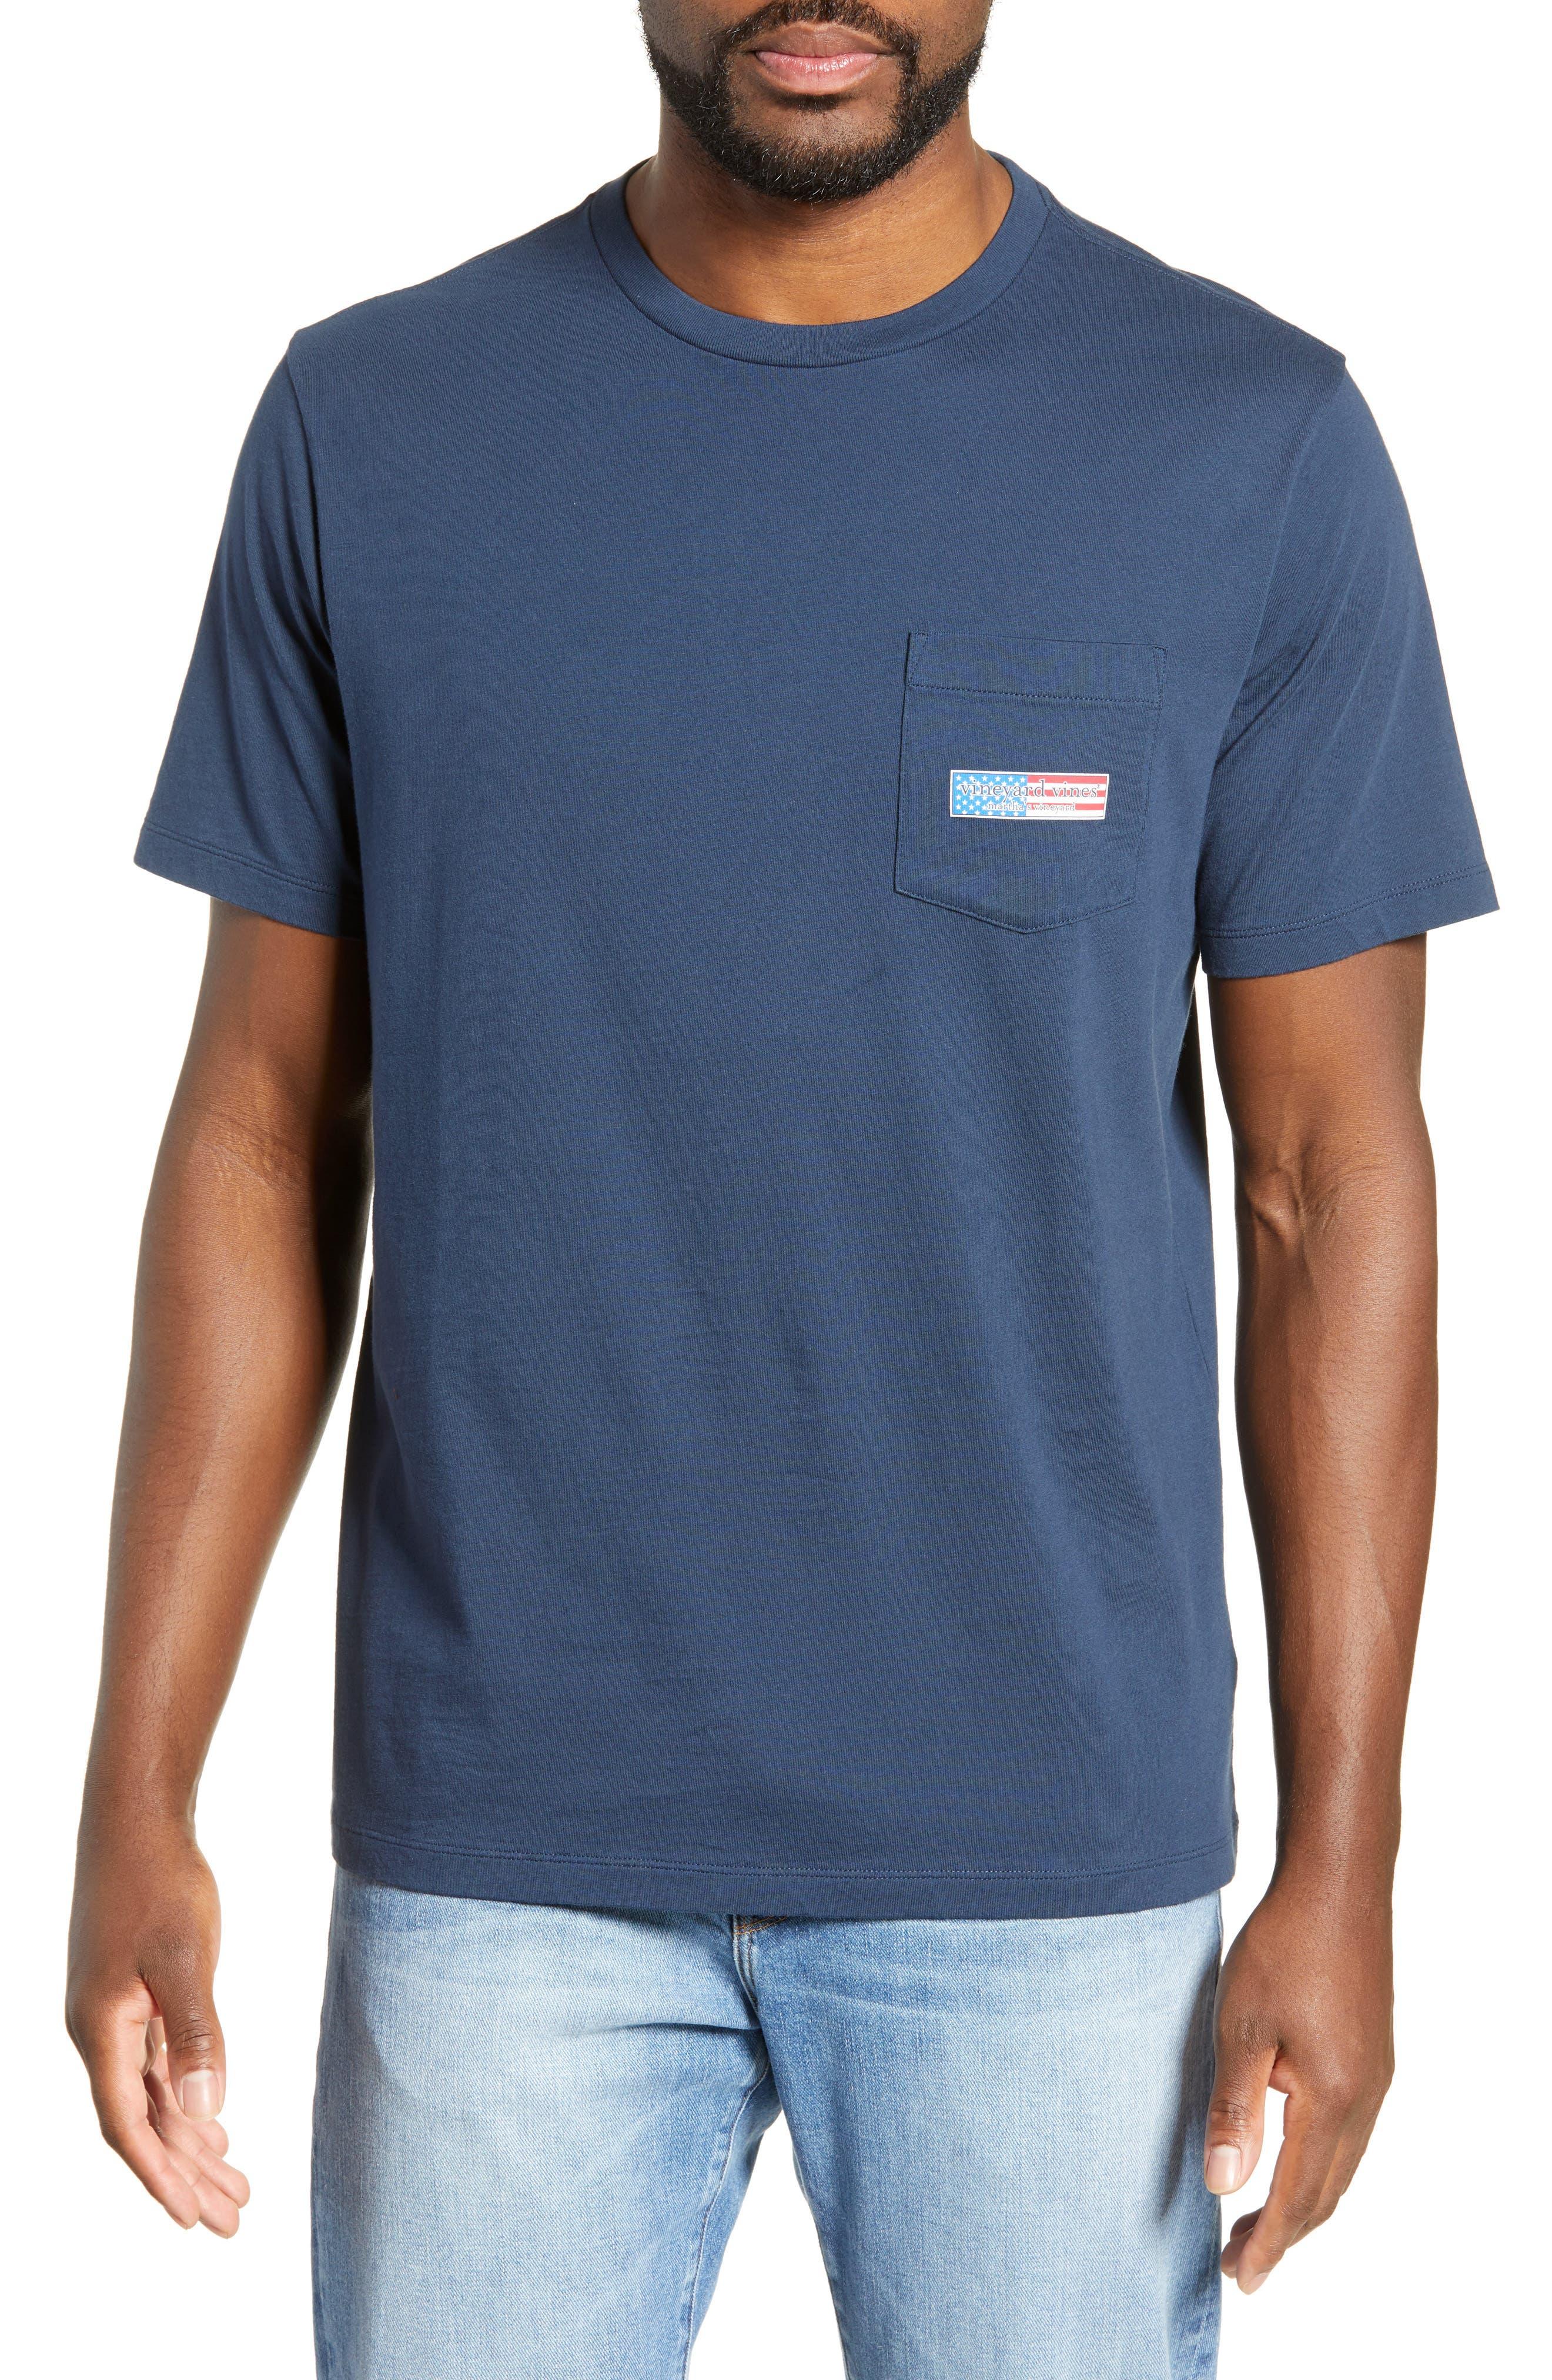 bca41dac6c40 Men s Vineyard Vines T-Shirts